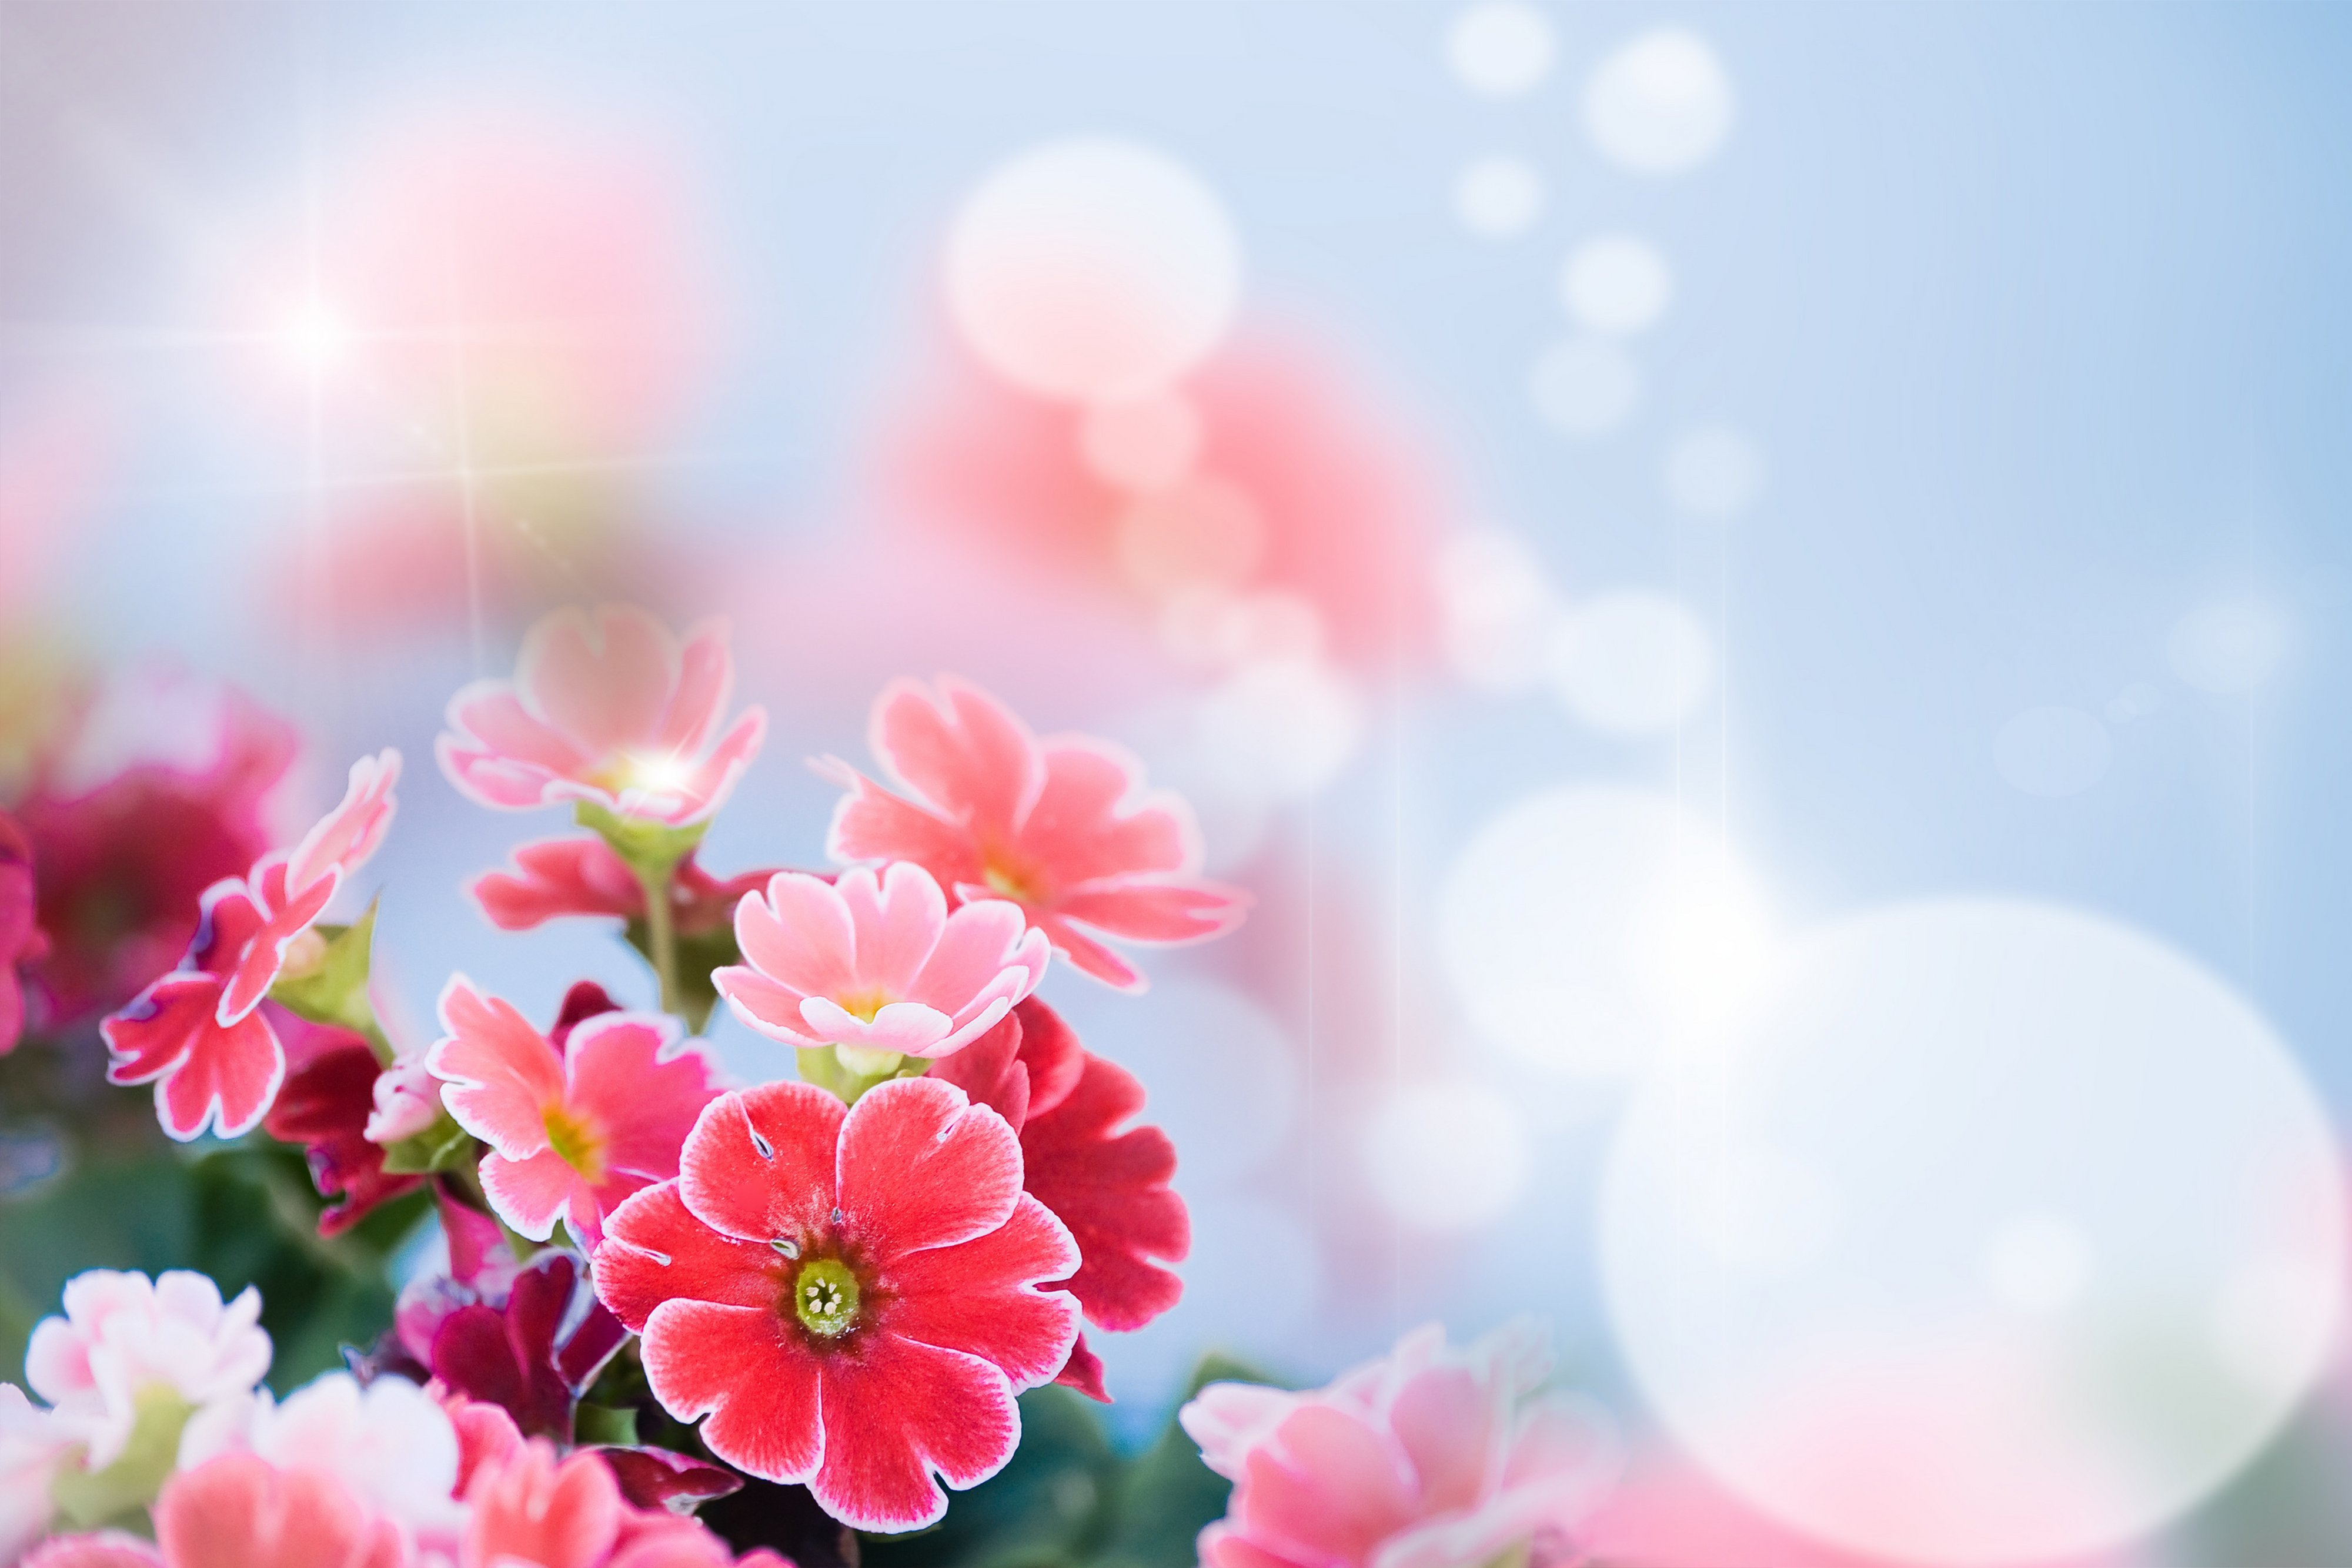 Фото с цветами фон для